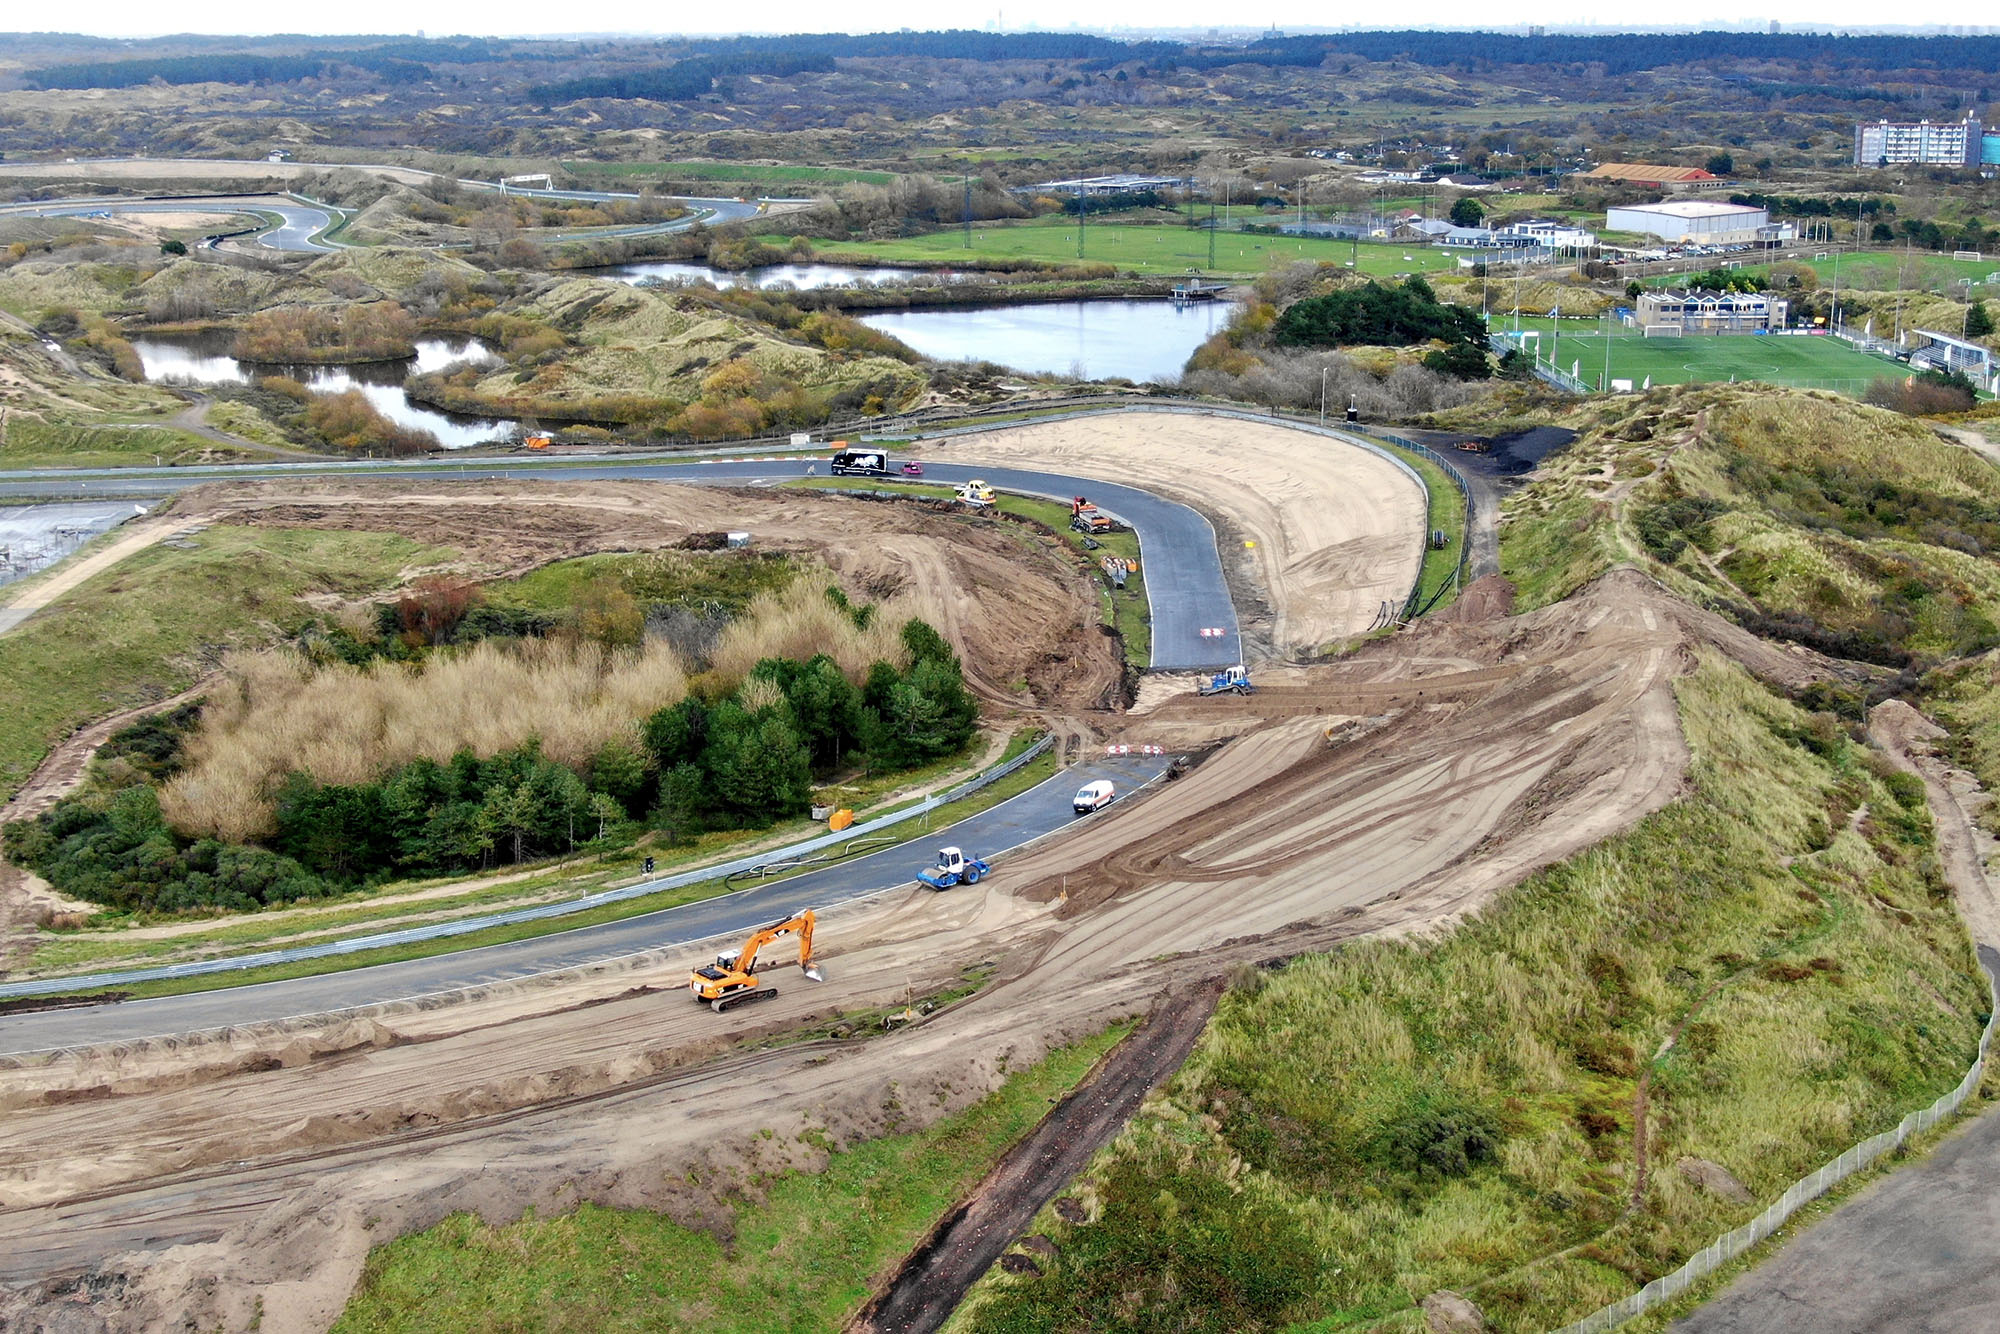 Construction work on the final corner at Zandvoort ahead of next year's Dutch Grand Prix